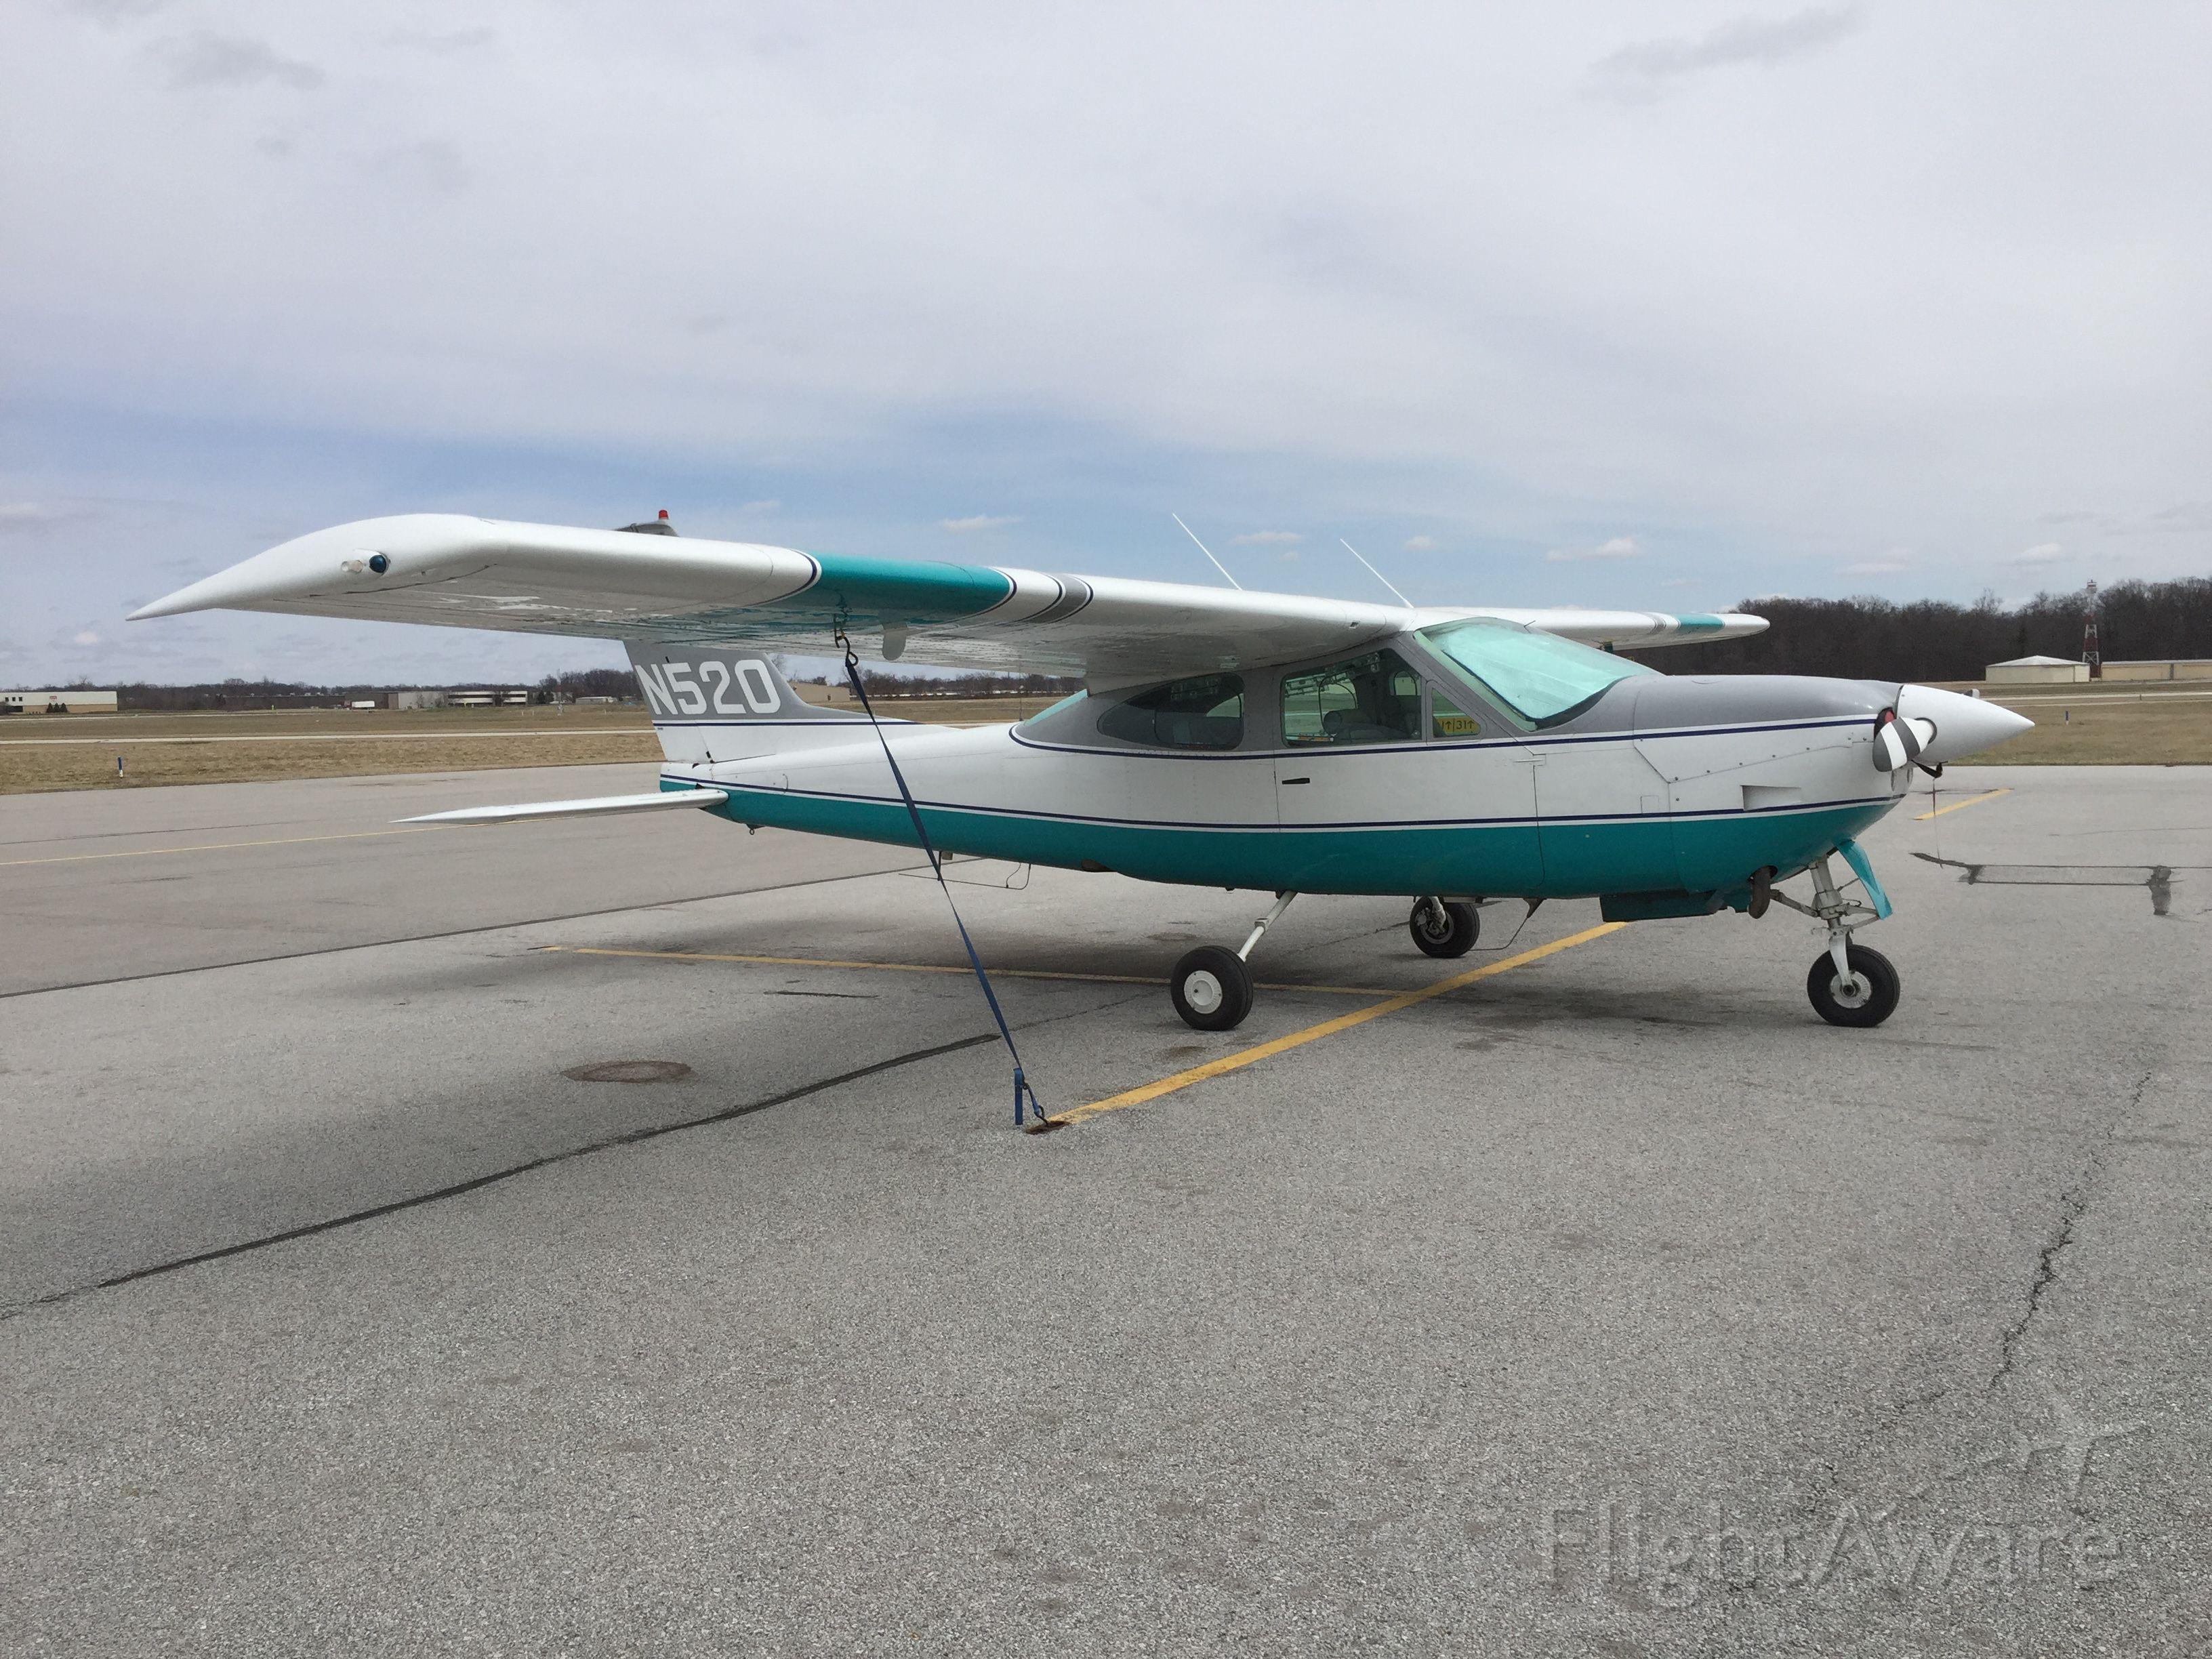 Cessna 177RG Cardinal RG (N520)